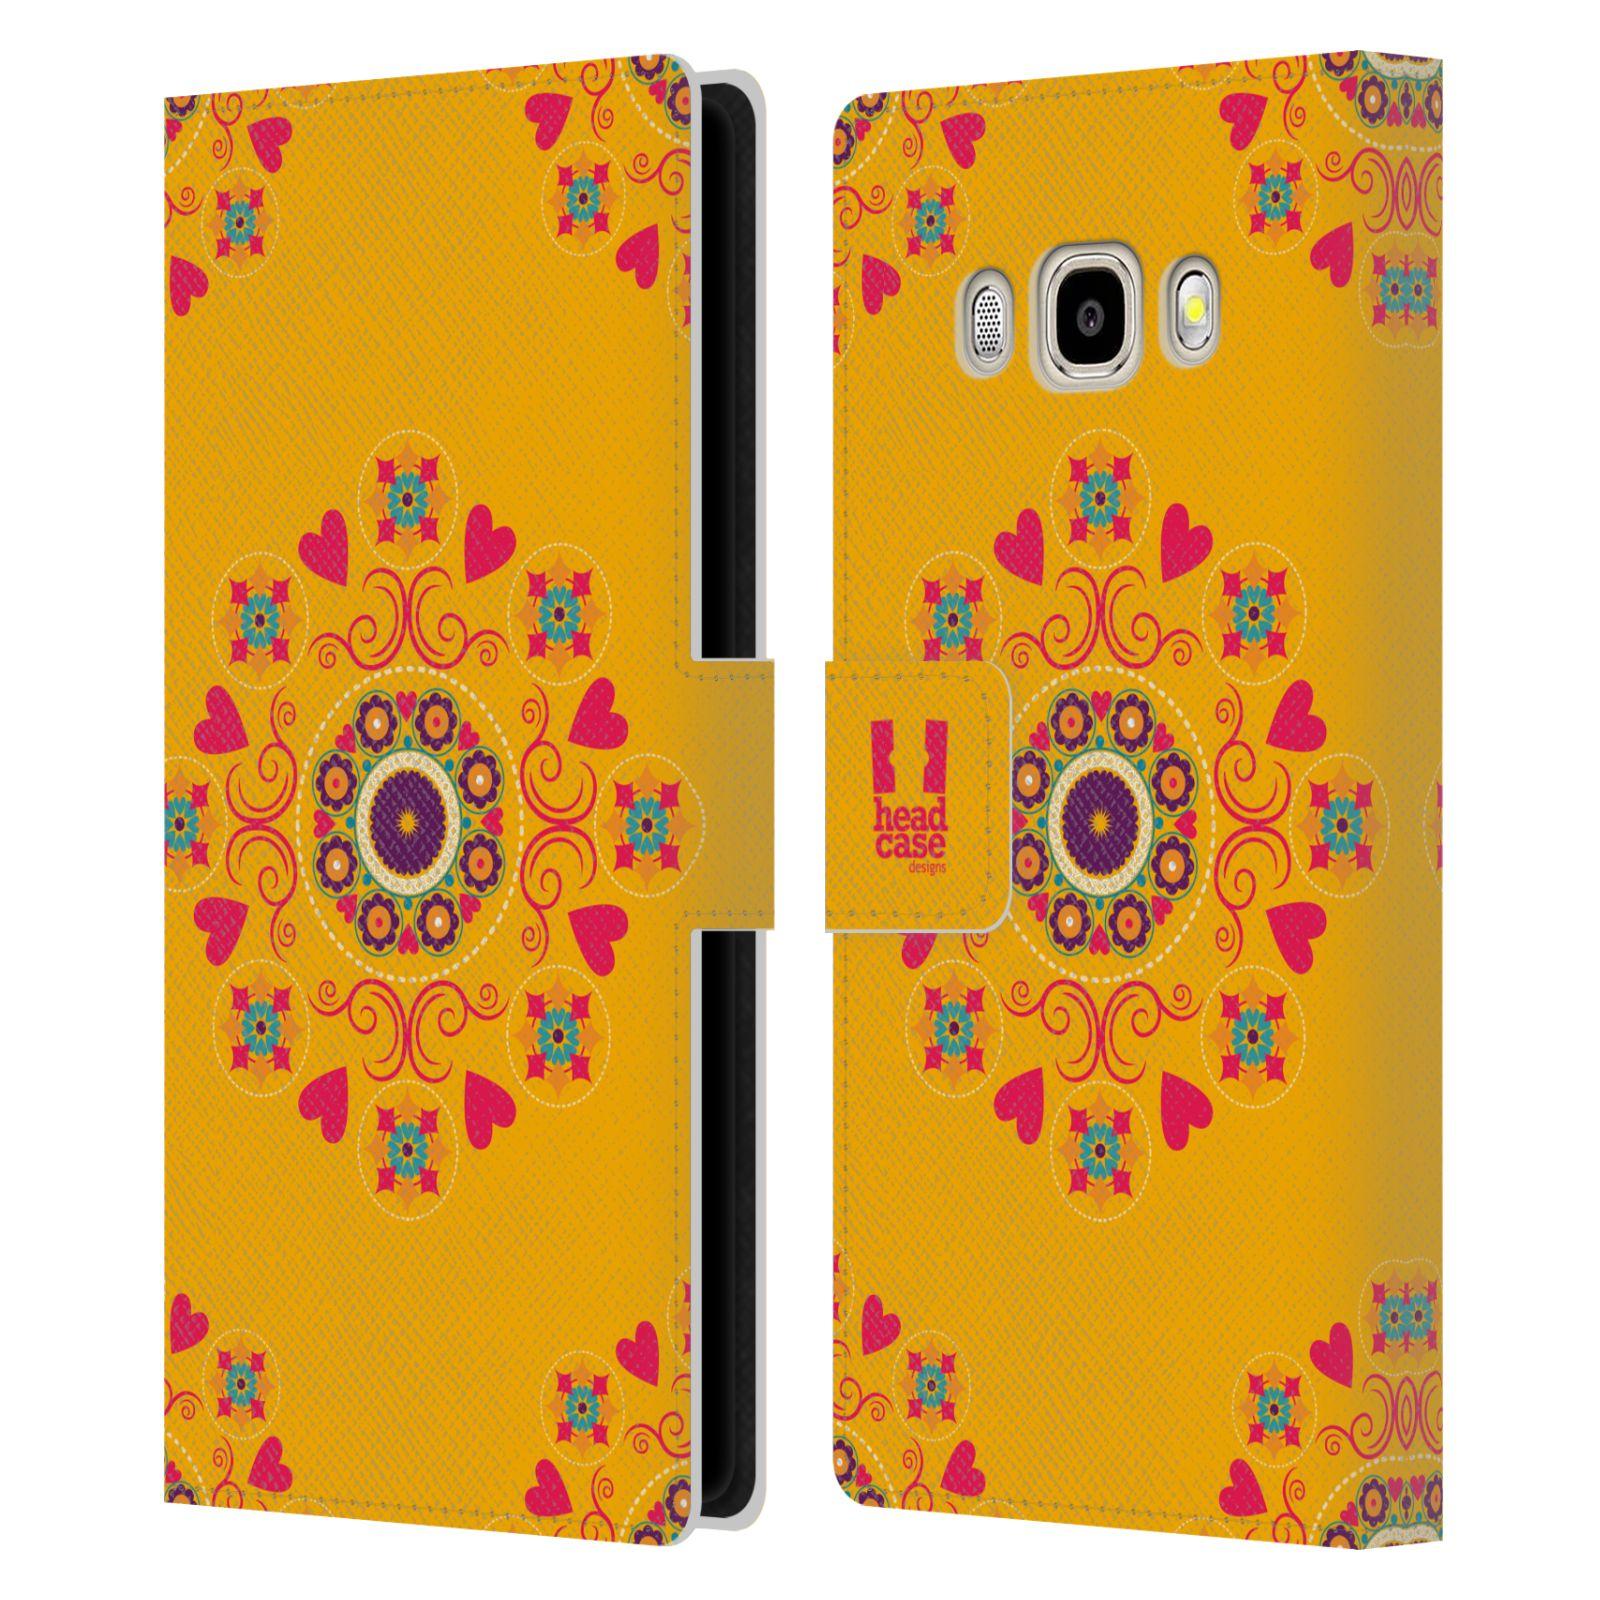 HEAD CASE Flipové pouzdro pro mobil Samsung Galaxy J5 2016 Slovanský vzor květiny a srdíčka žlutá